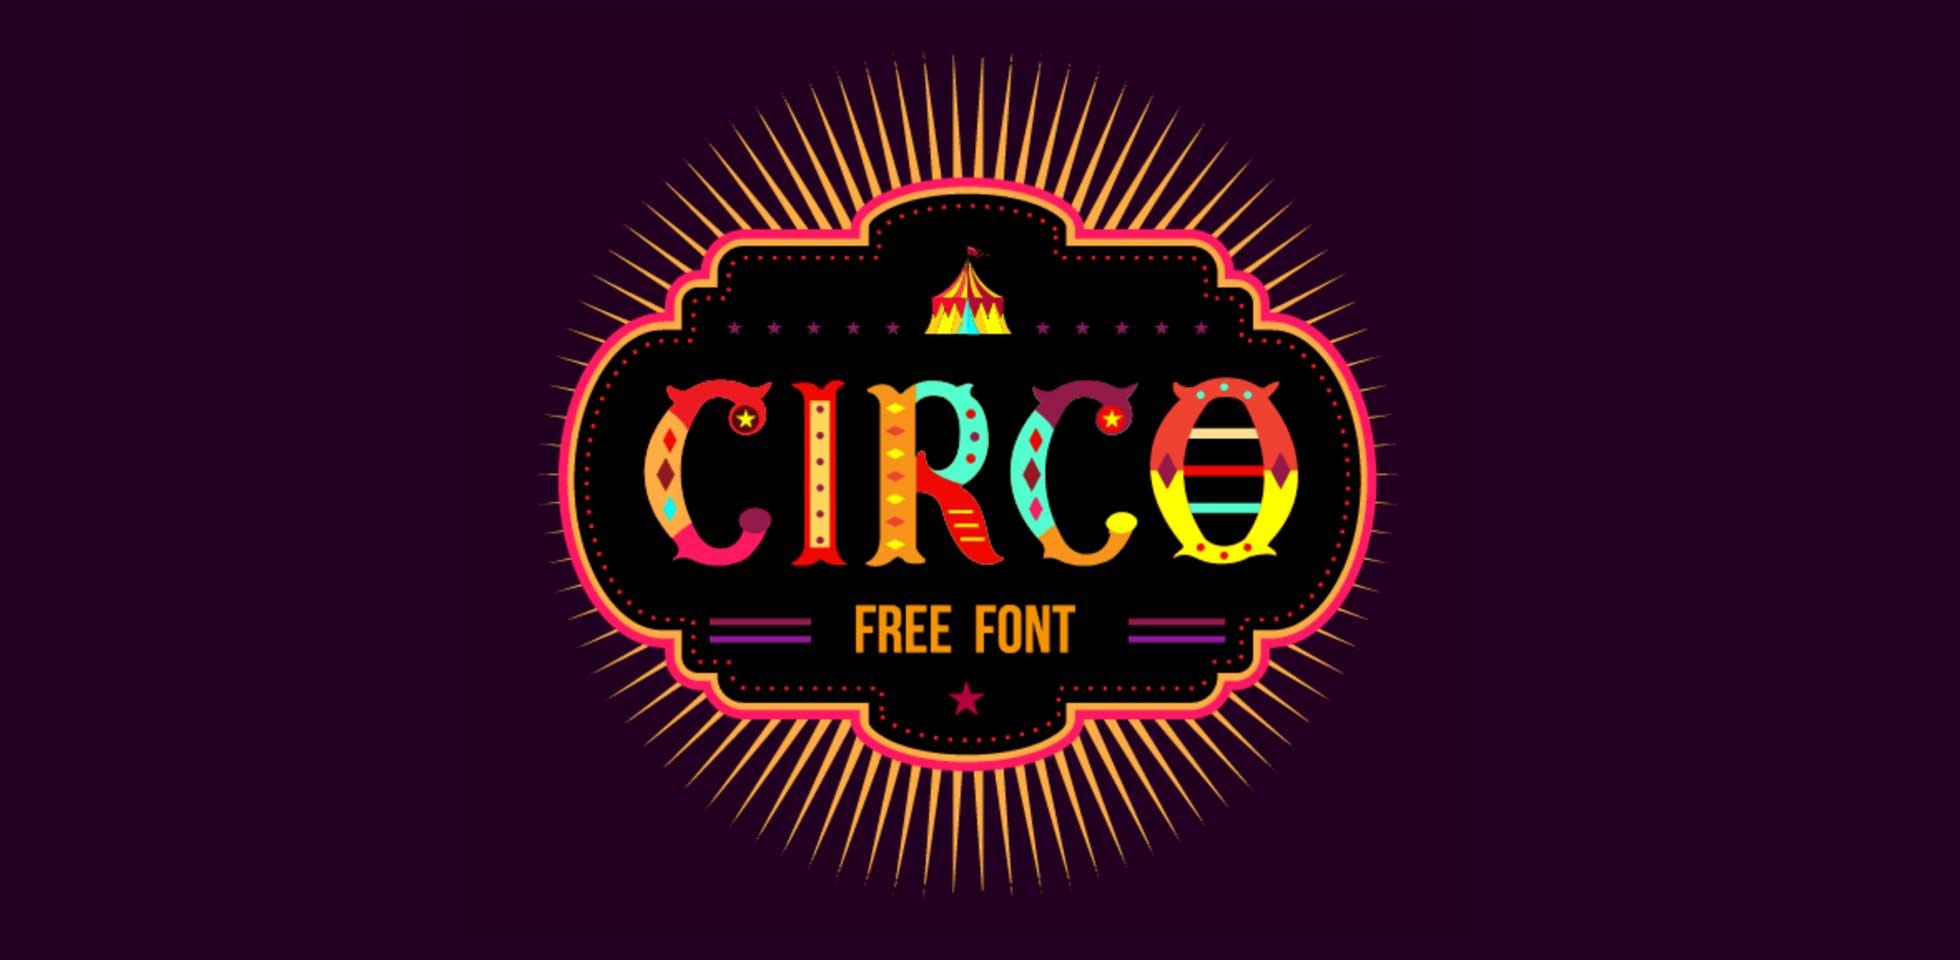 Free Download: CIRCO Font